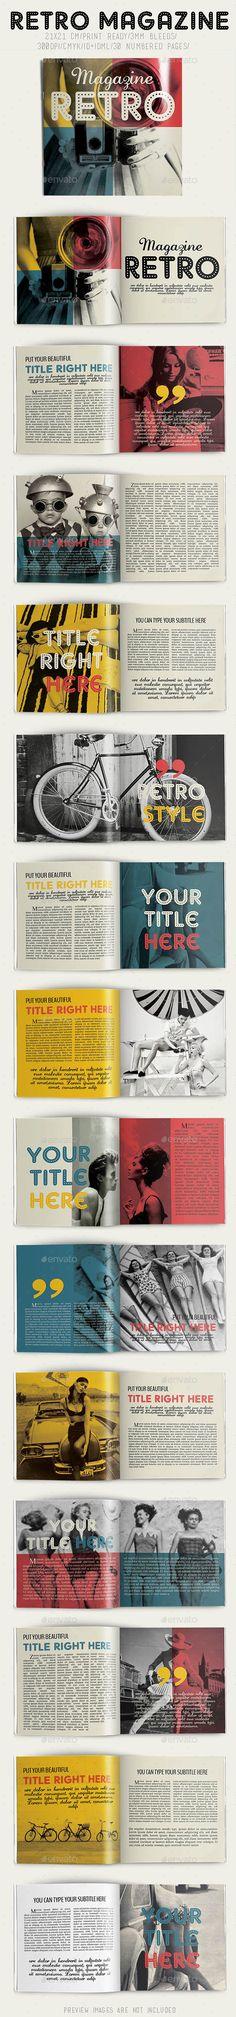 Retro Magazine — InDesign INDD #retro #letter • Available here → https://graphicriver.net/item/retro-magazine/8815658?ref=pxcr